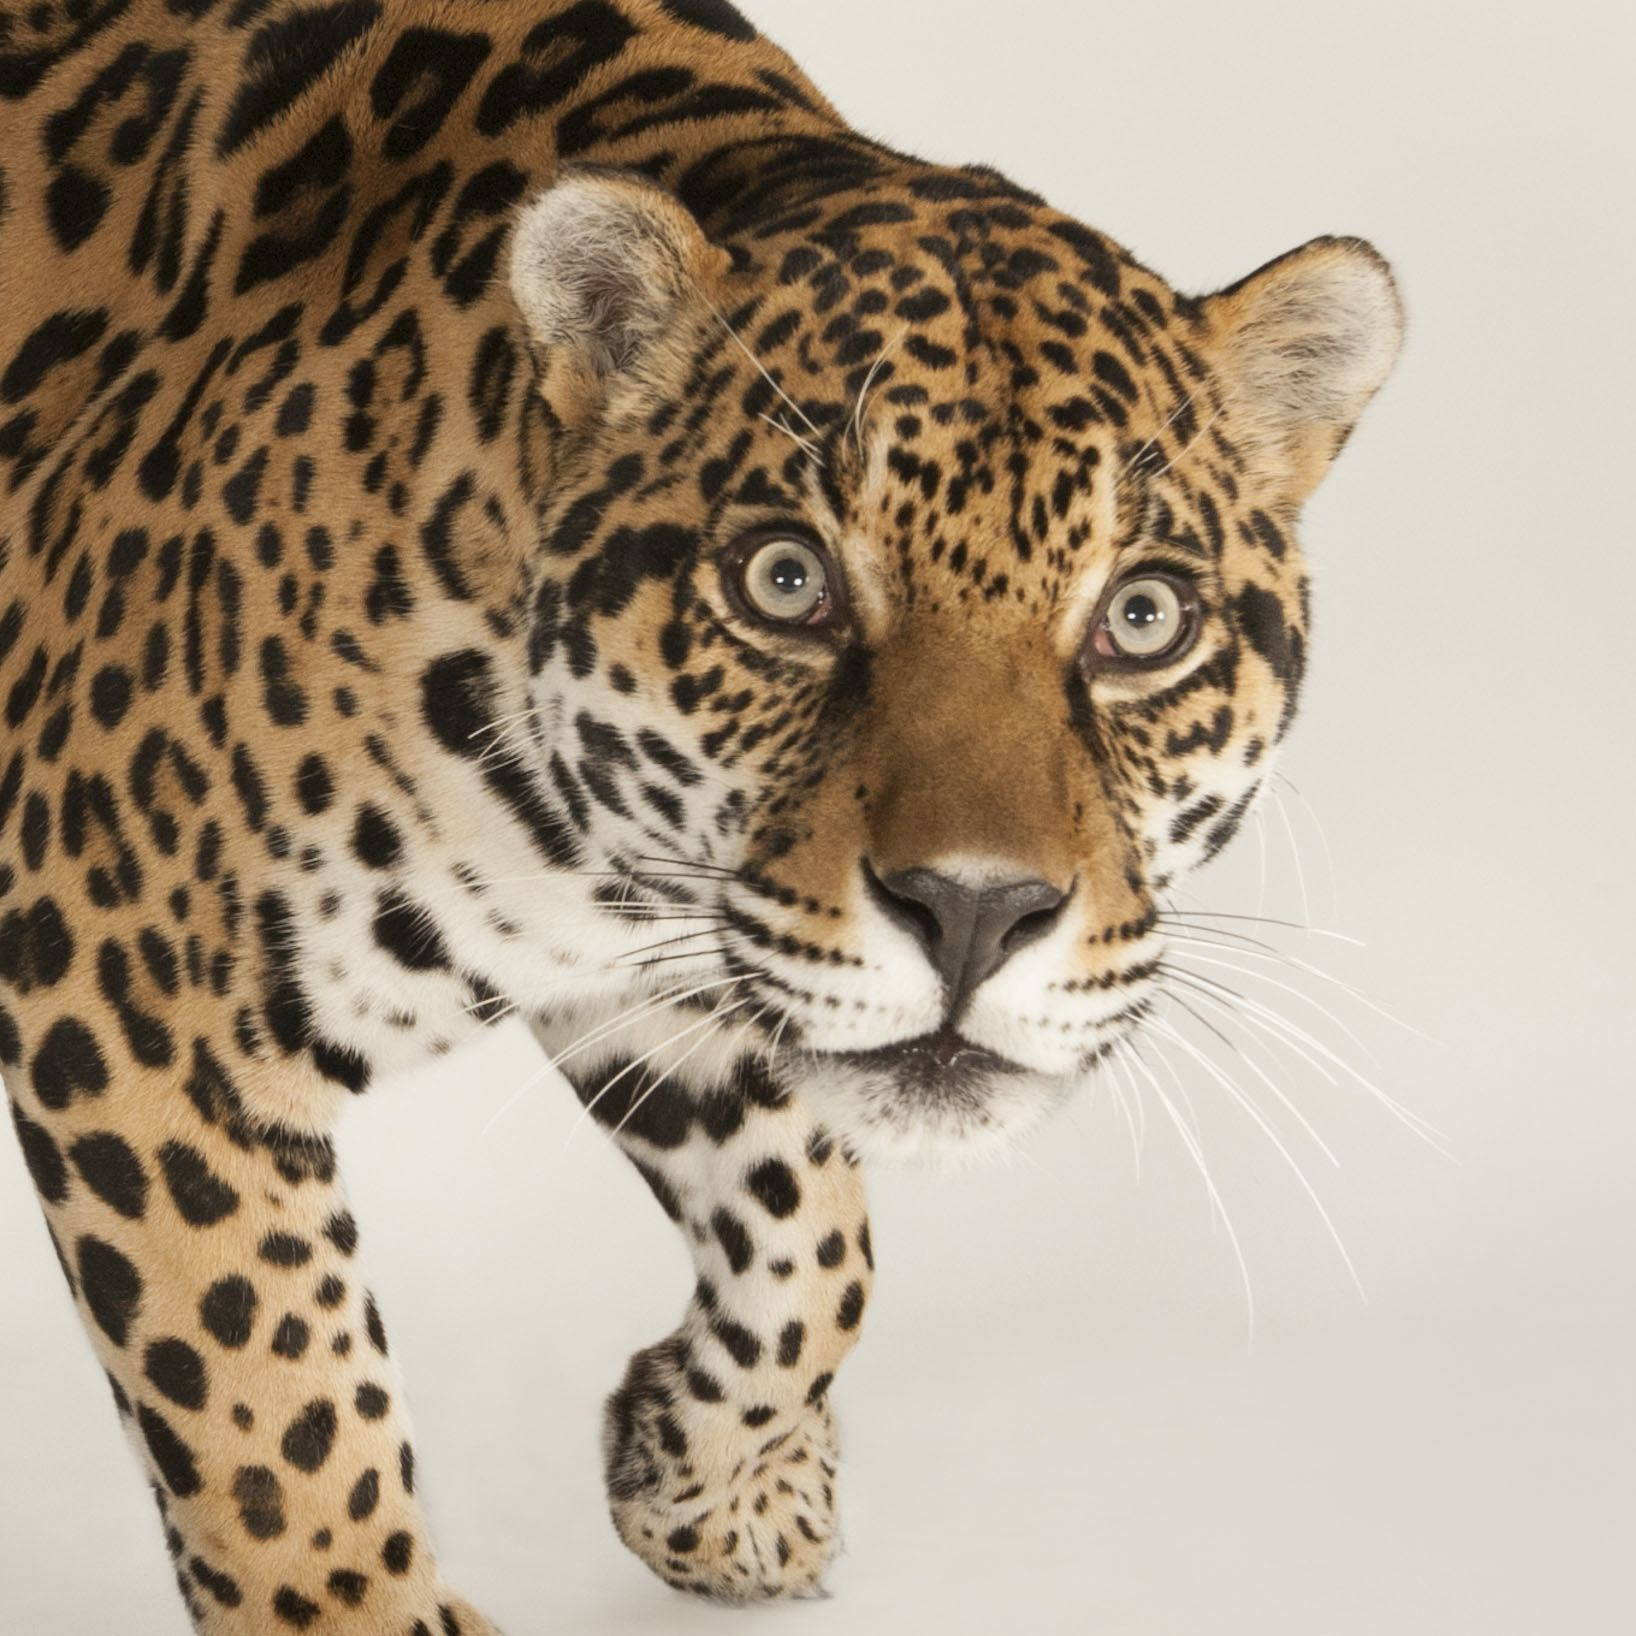 Jaguar | National Geographic